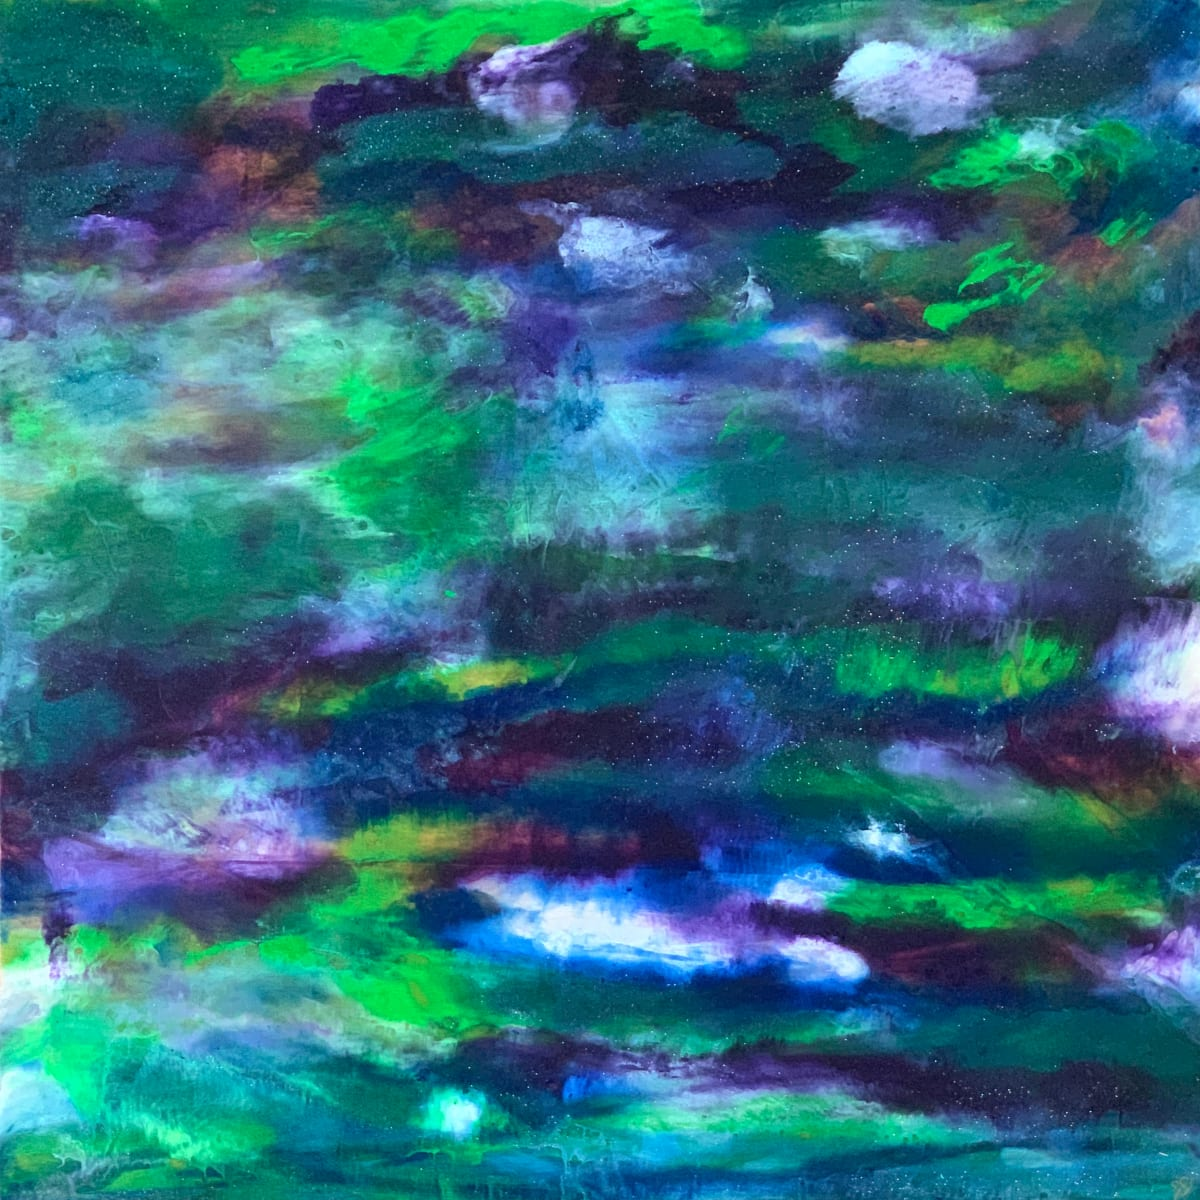 Ride The Wild Wind by Susi Schuele